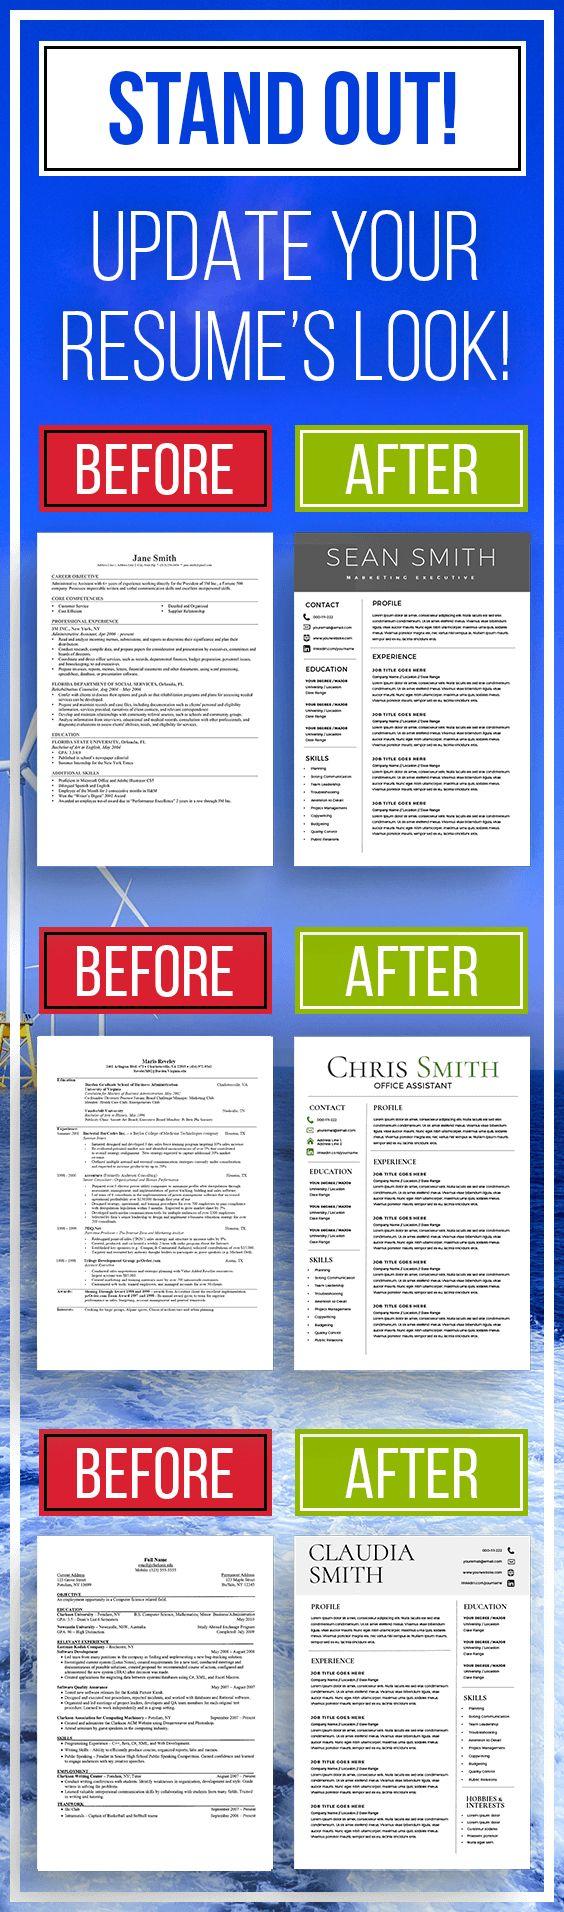 Update your Resume's Look! resume update, post resume